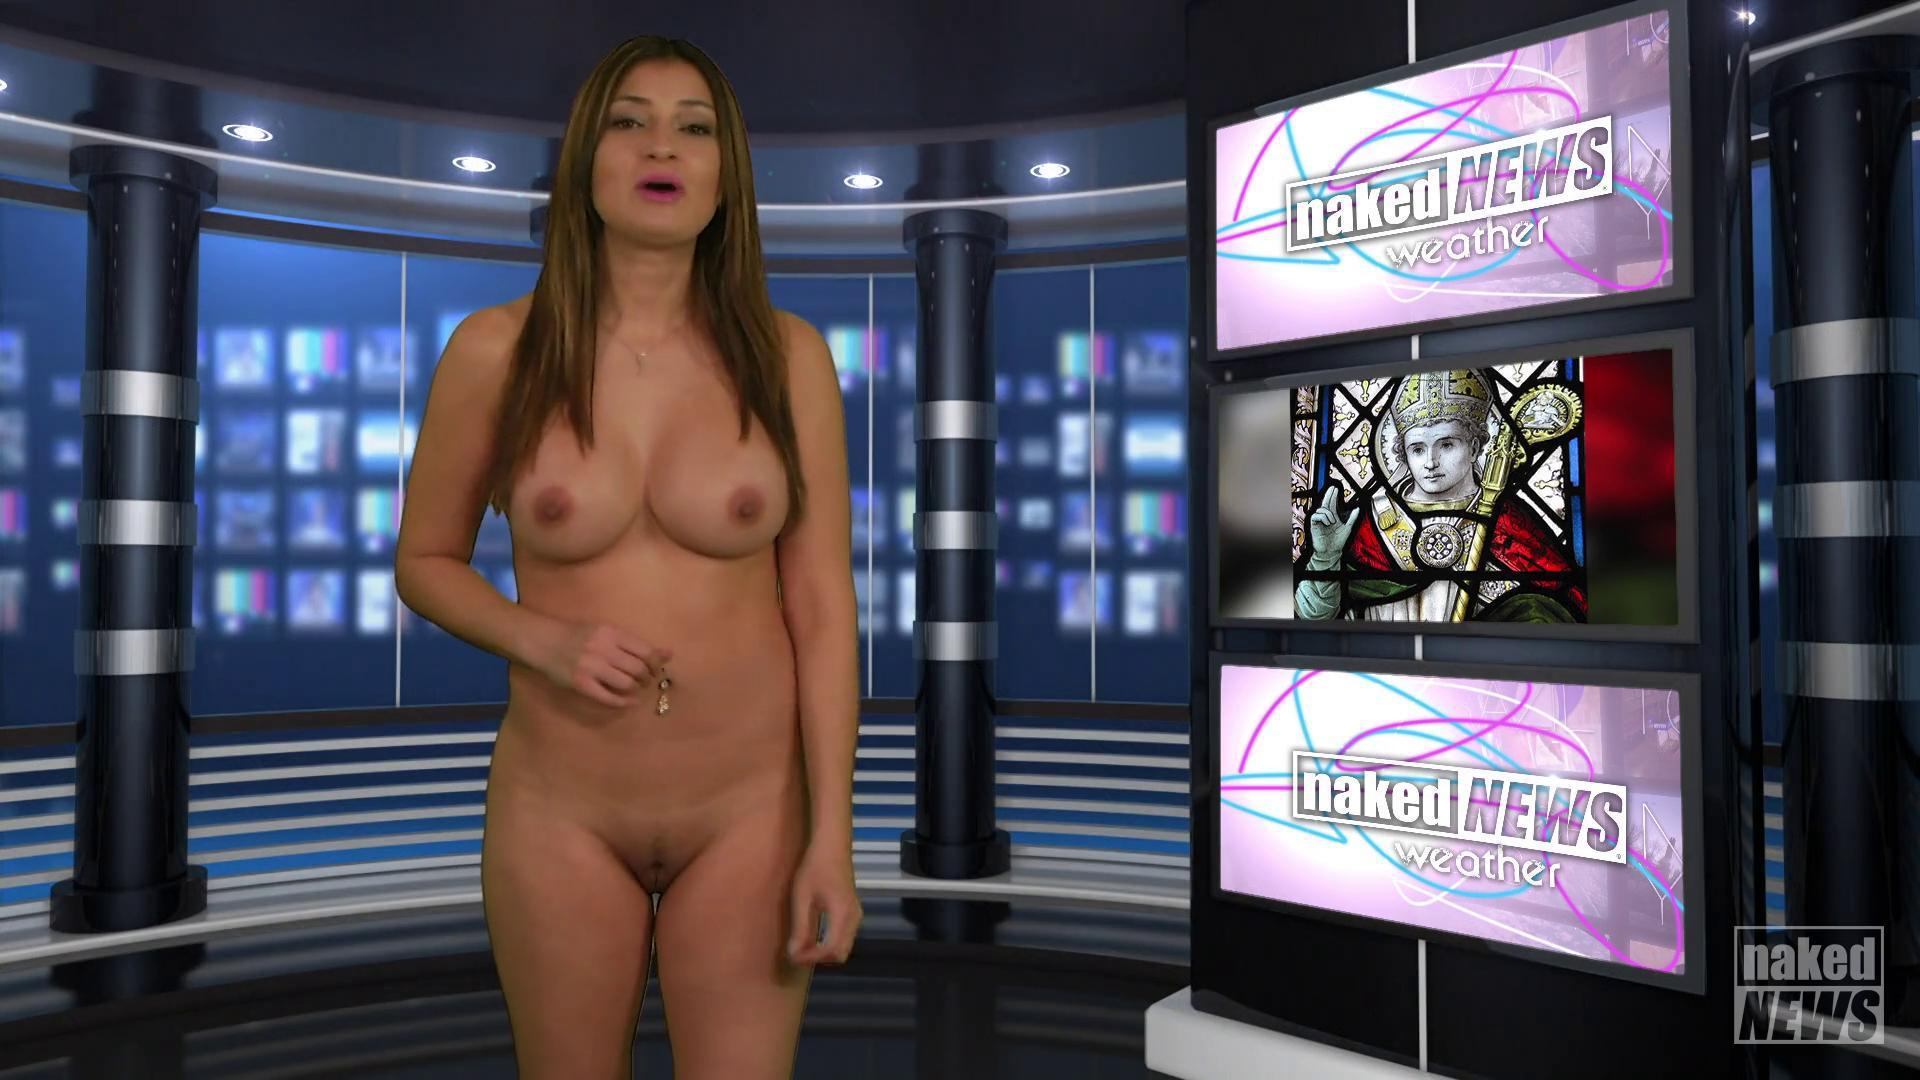 Weather girl nude Sexy weather